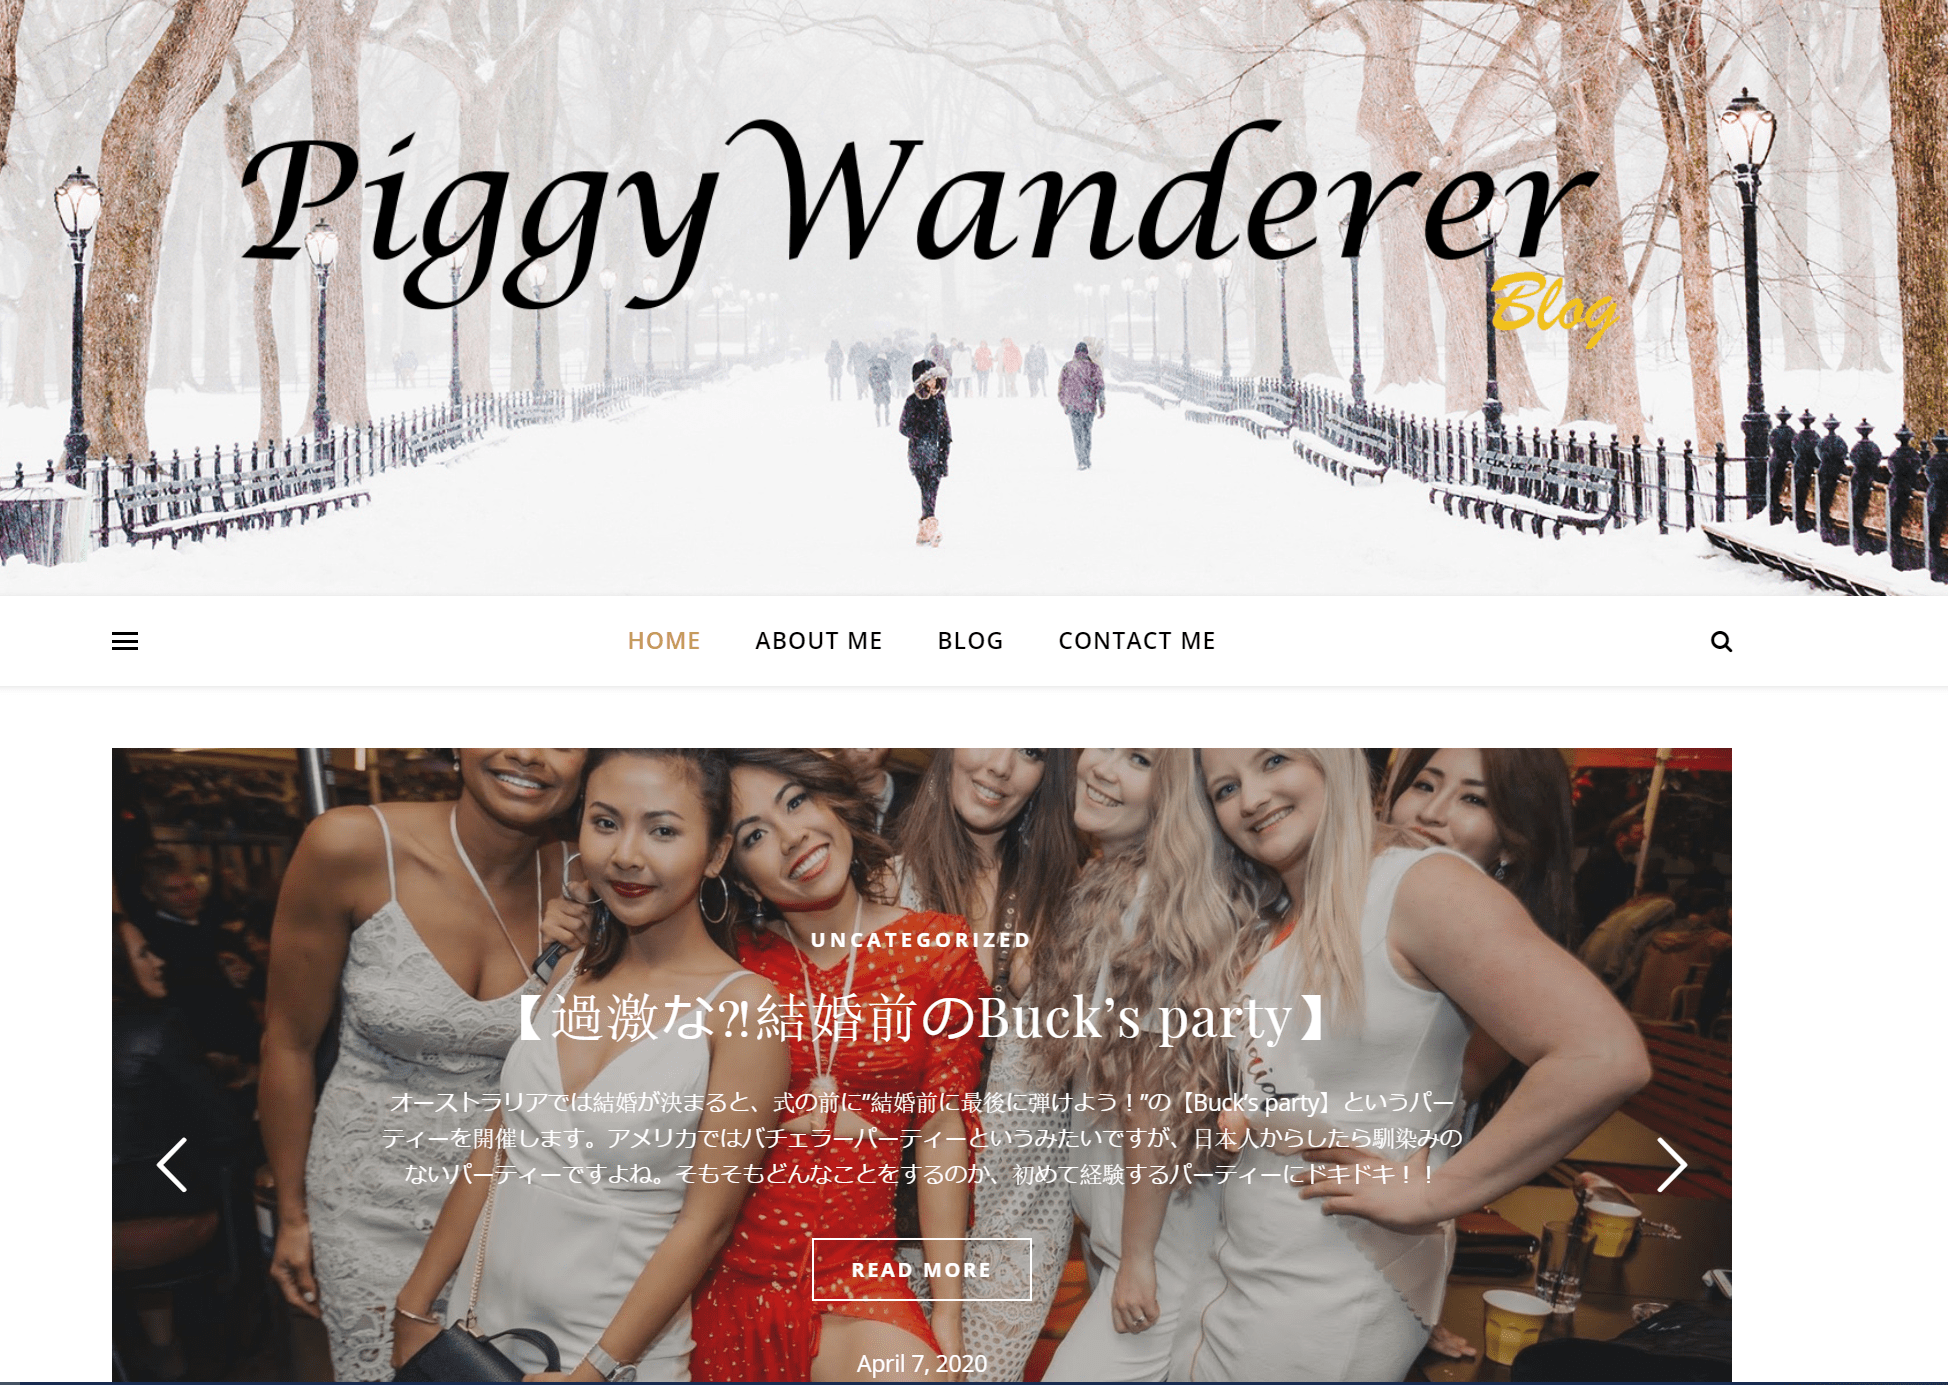 PiggyWanderer